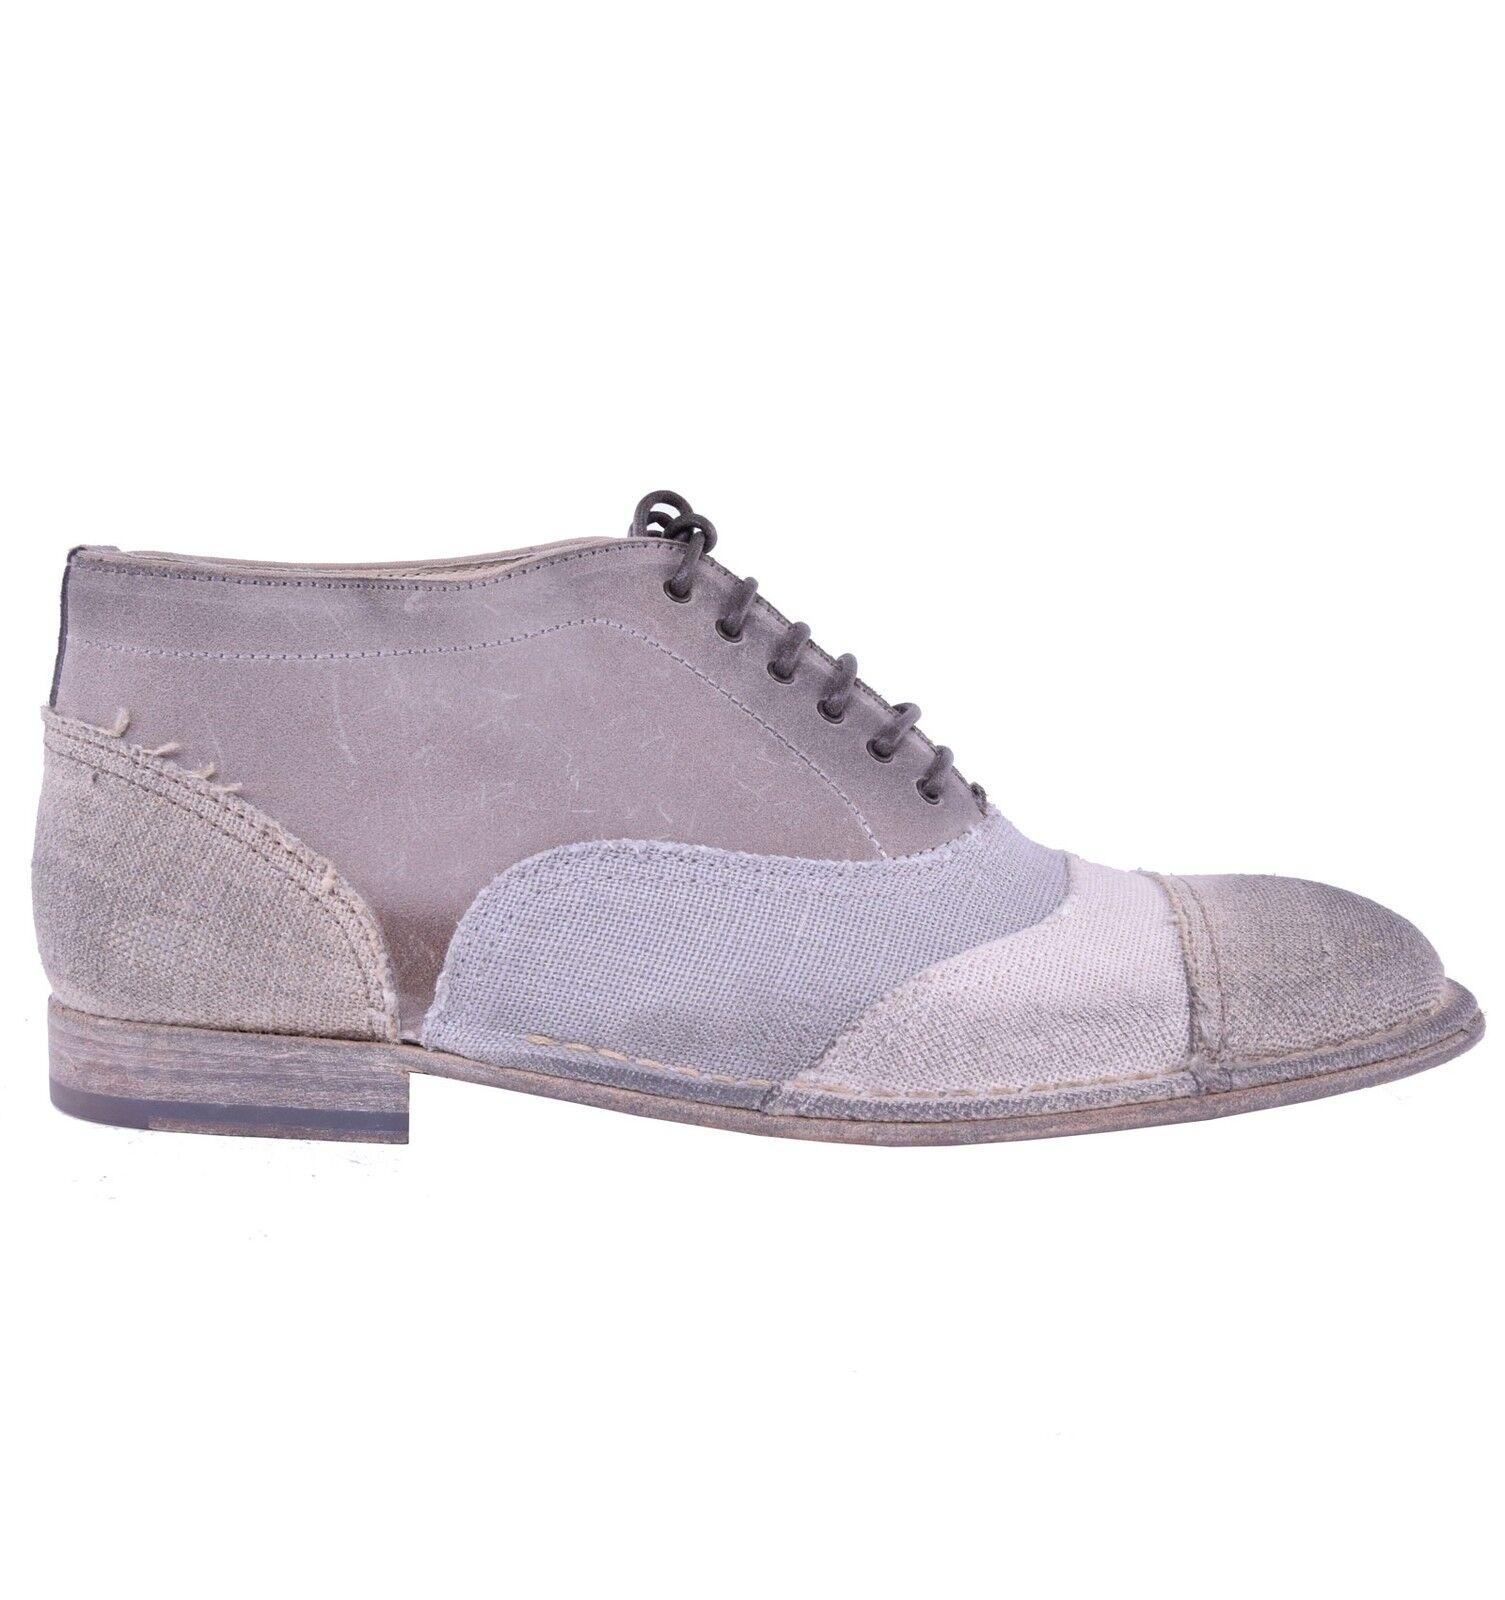 DOLCE & GABBANA Hohe Patchwork Schuhe Grau Beige High-Top Shoes Grey 03876